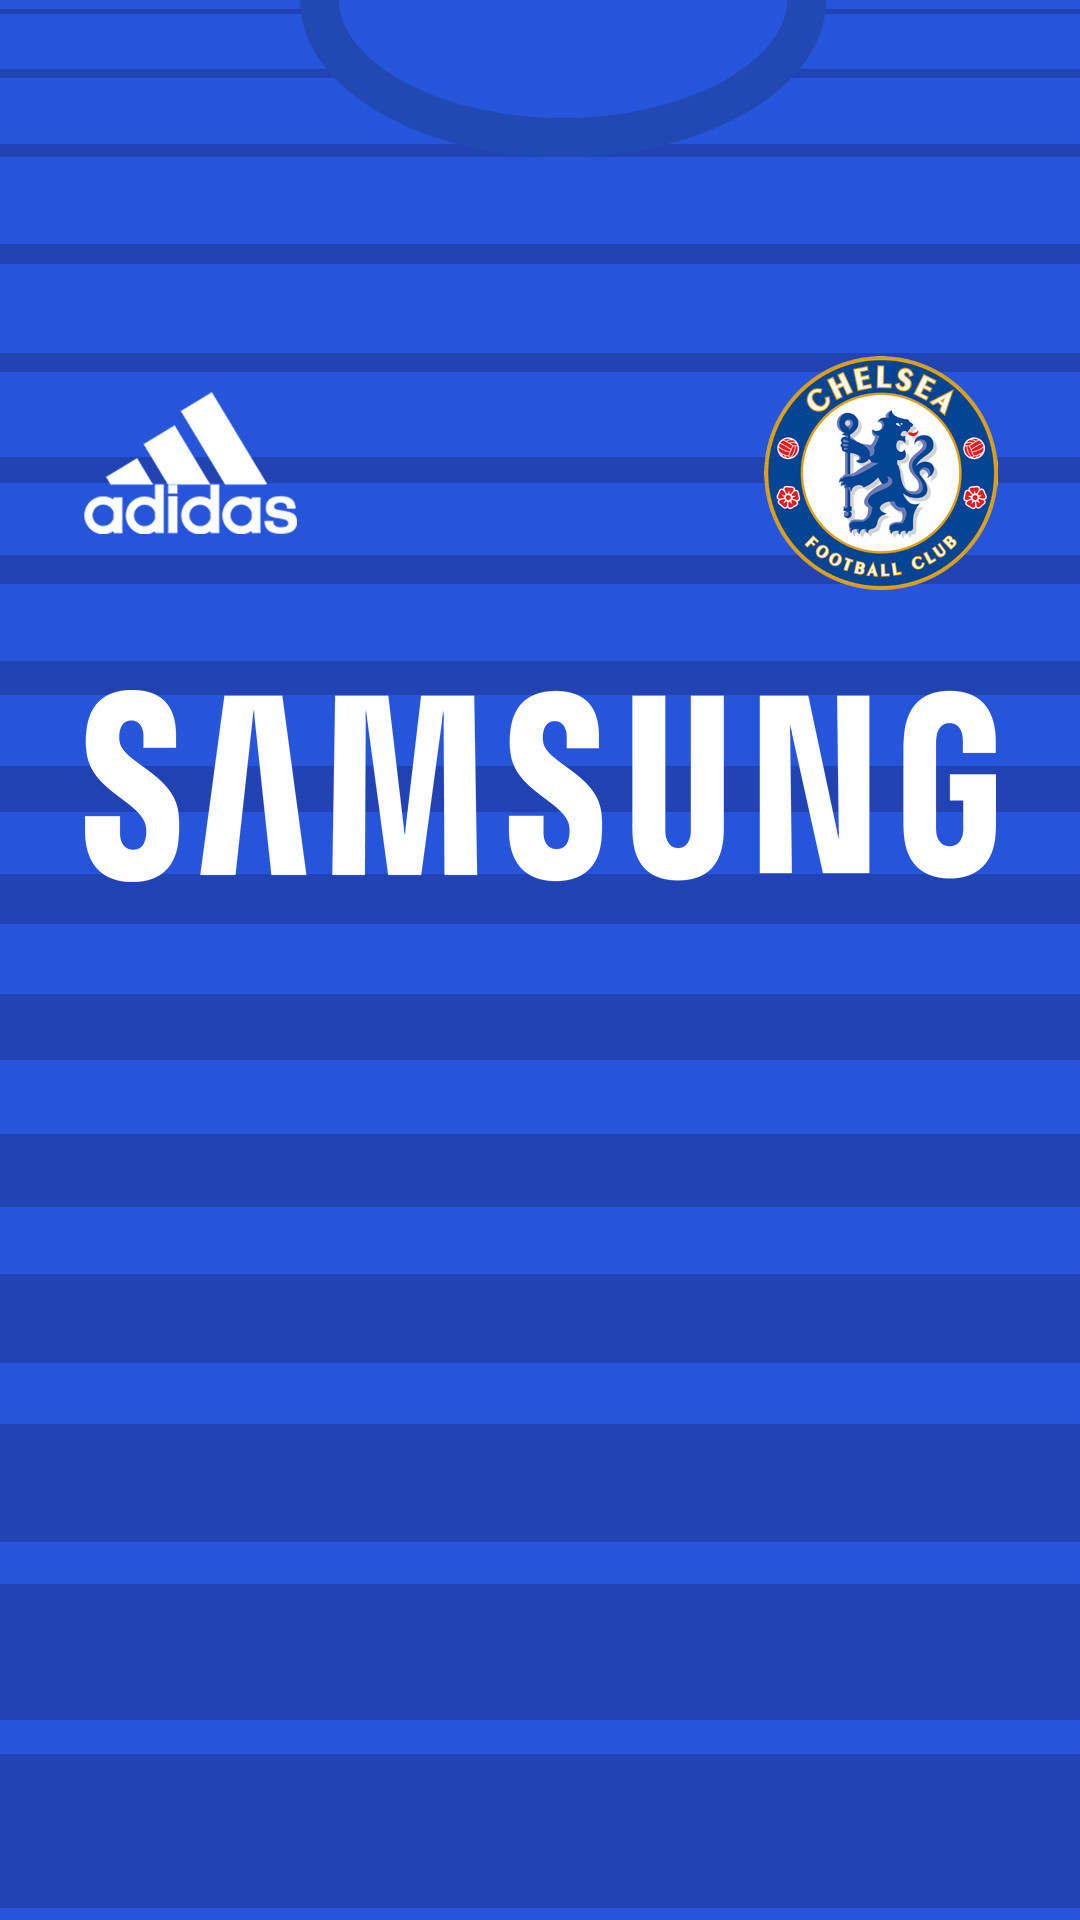 Best Wallpaper Logo Messi - 710086-widescreen-barcelona-logo-2018-wallpaper-1080x1920-for-mac  Pic_183665.jpg